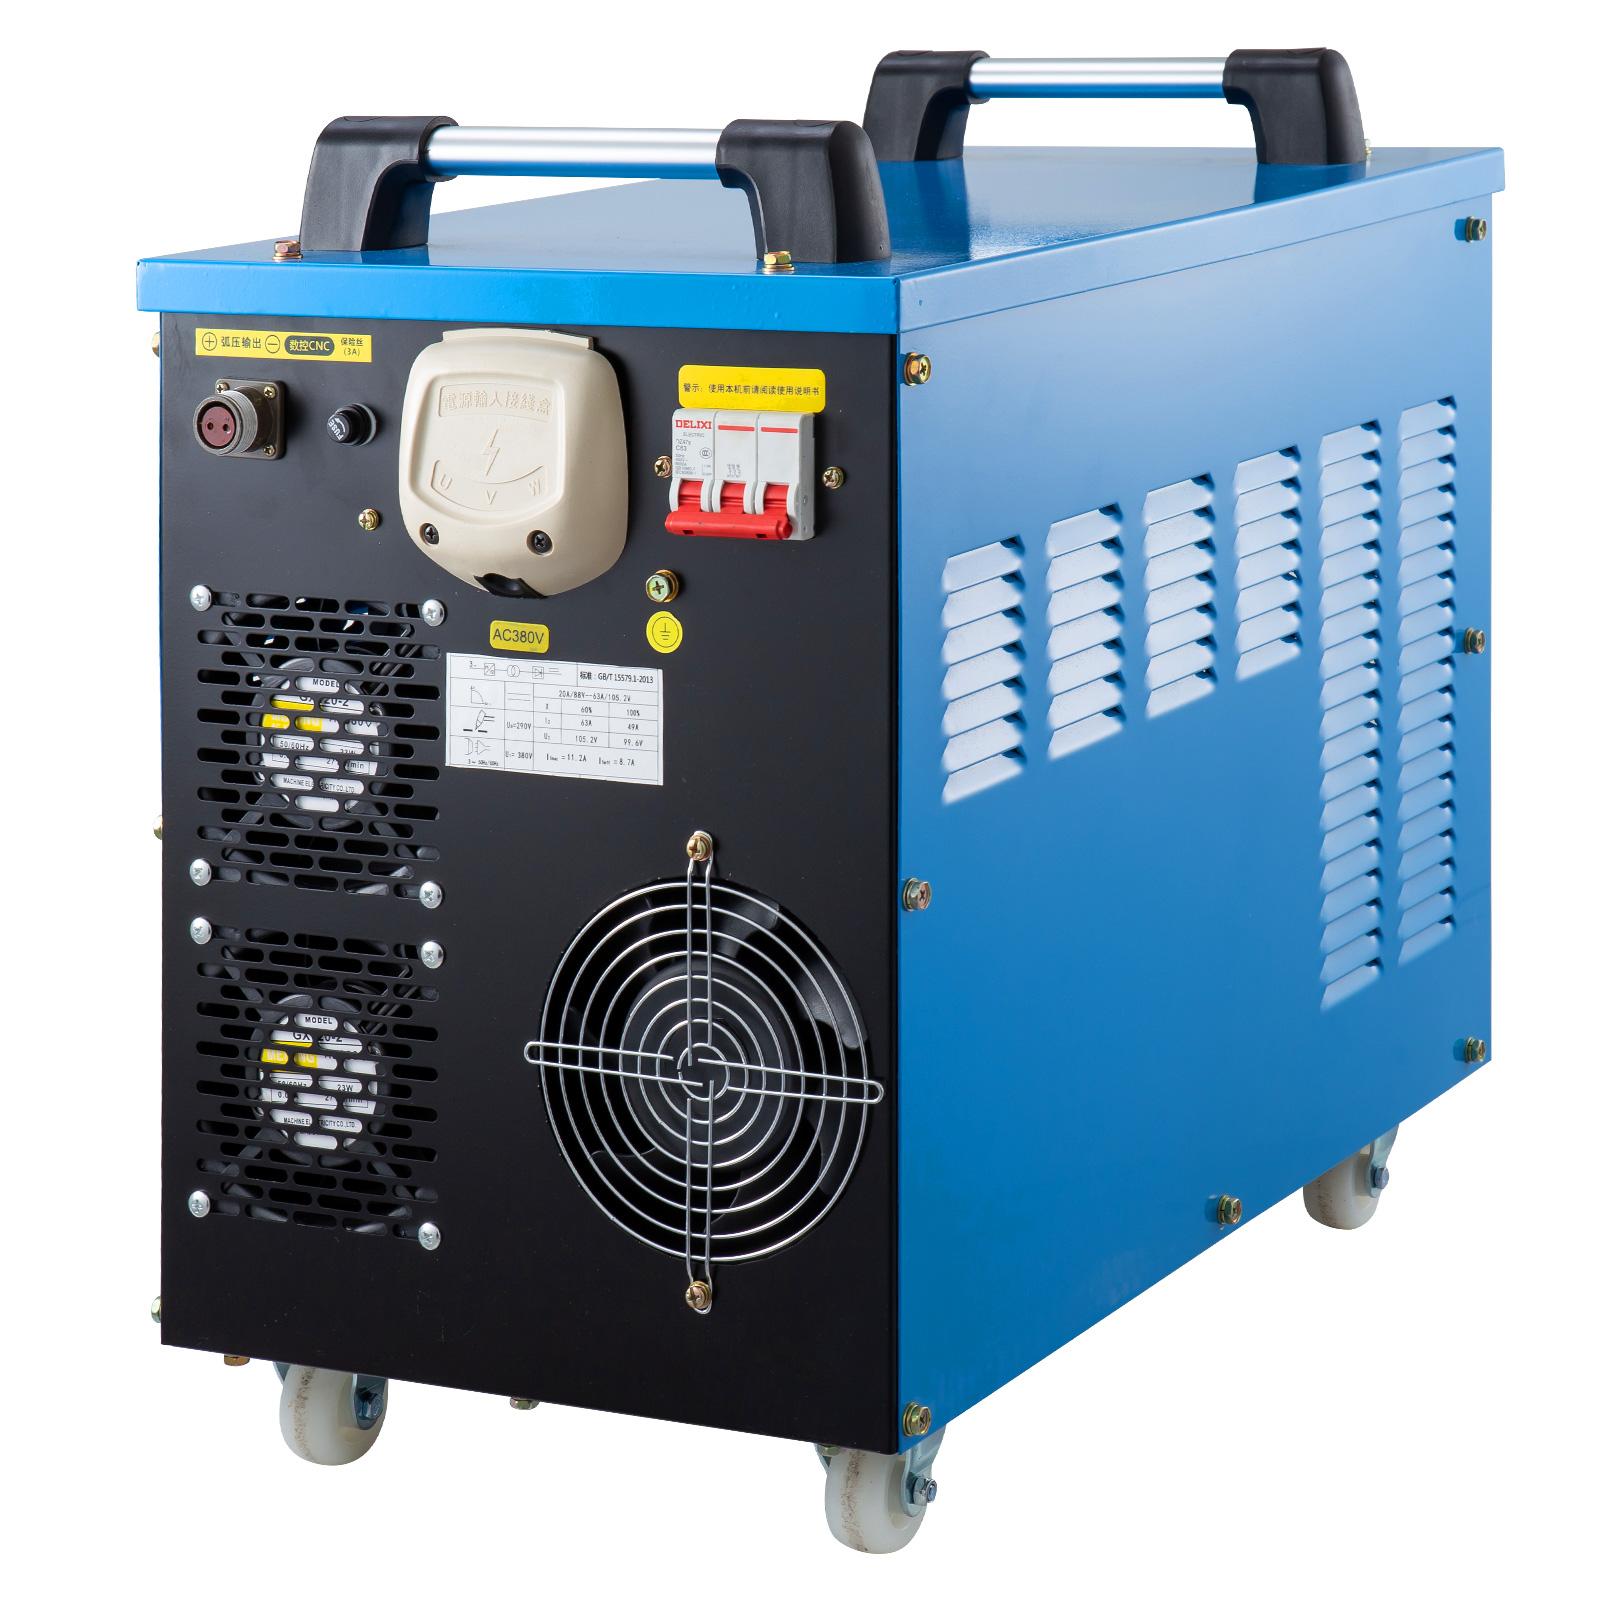 40-85A-Plasma-Cutter-Built-In-Air-Compressor-Inverter-Cutting-Machine-Cut-35mm thumbnail 47